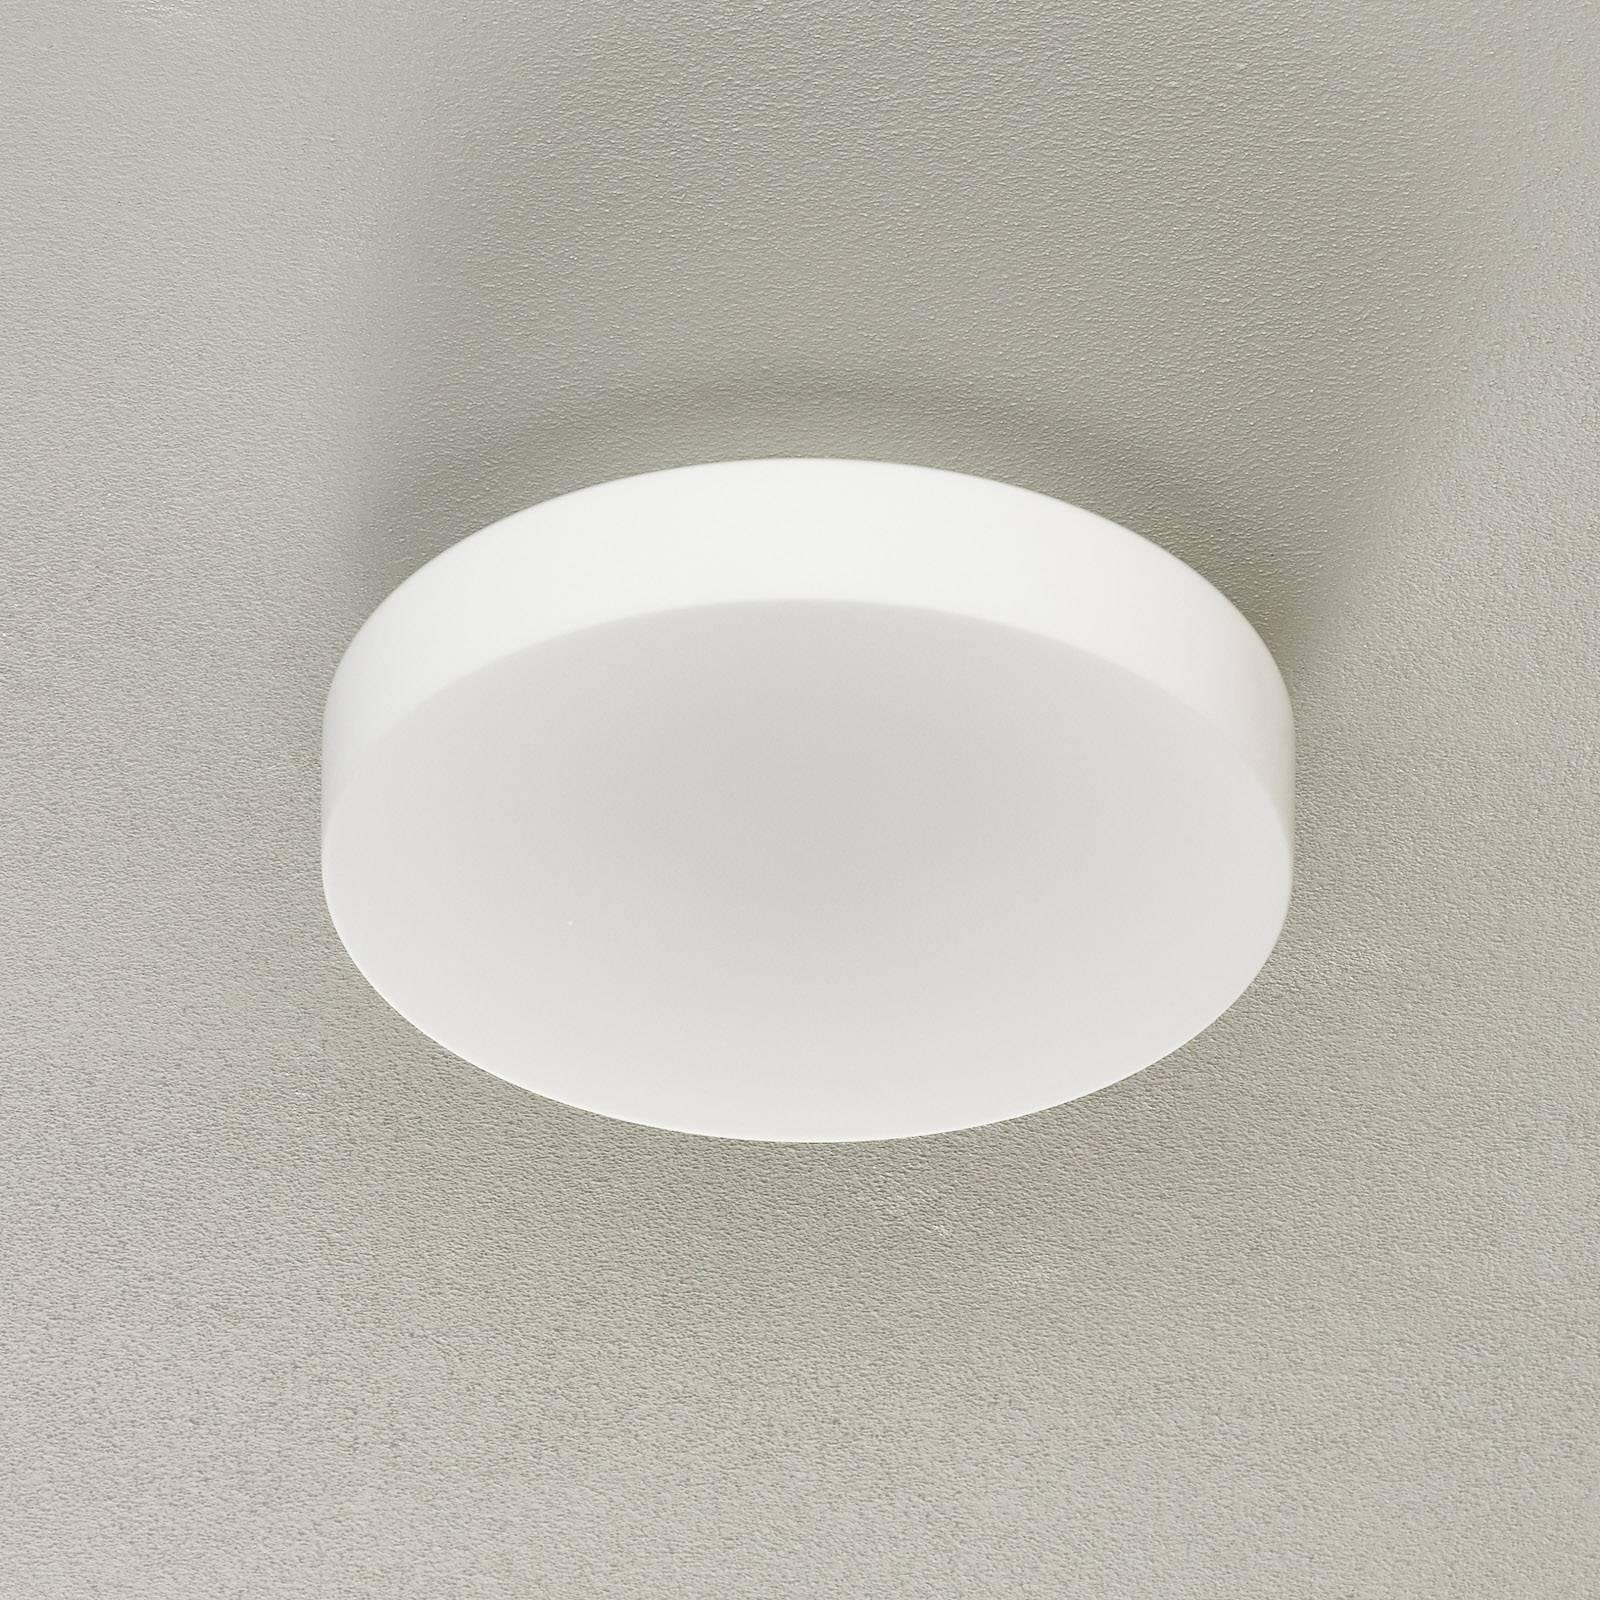 BEGA 89764 LED-kattolamppu E27 valkoinen Ø 34cm